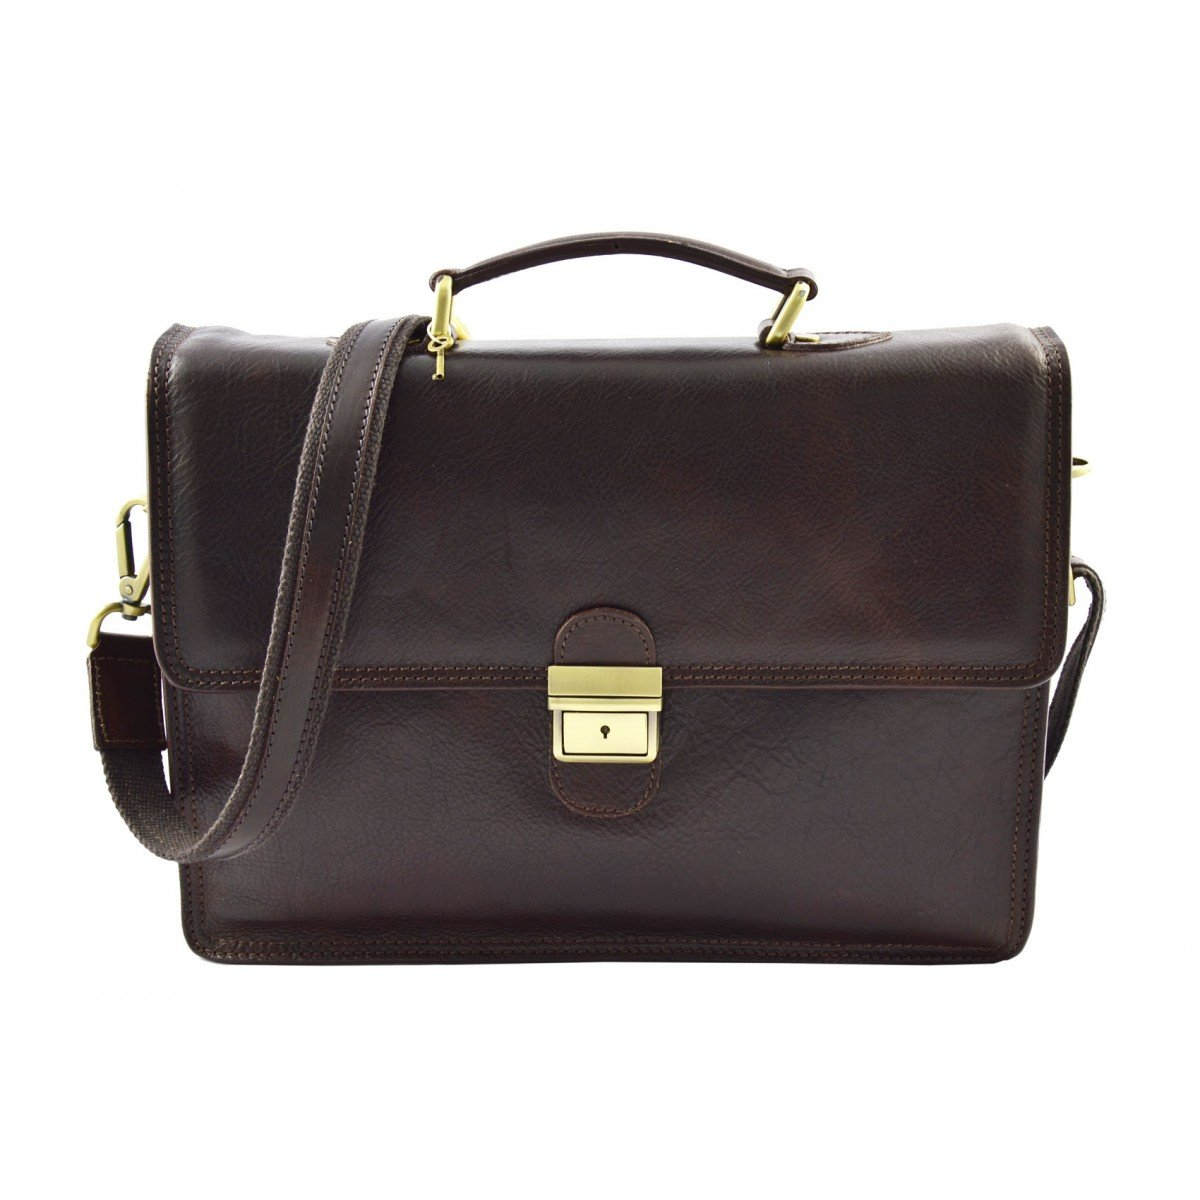 Dream Leather Bags Made in Italy Genuine Leather メンズ US サイズ: 1 カラー: ブラウン B074MNHH5Q